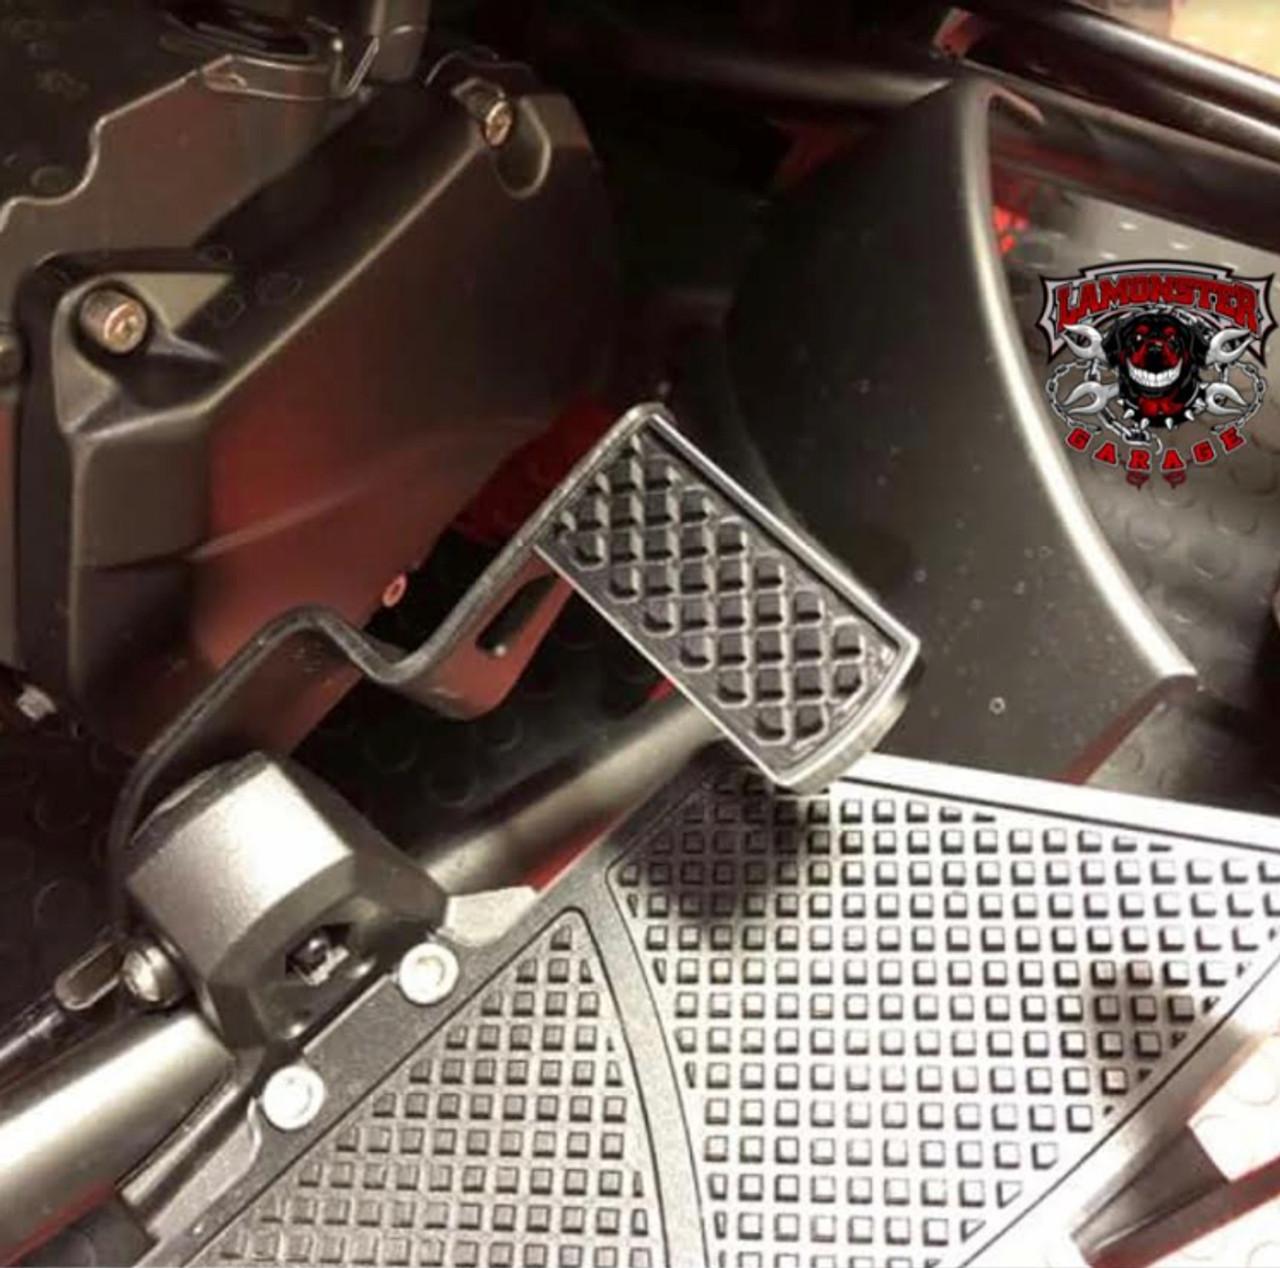 Lamonster Black Dymond Brake Pedal (LG-1009) (Accent Cut) Fits all Can-Am Spyder F3, RT, ST Models  (Shown with Lamonster Black Dymond Floorboards)